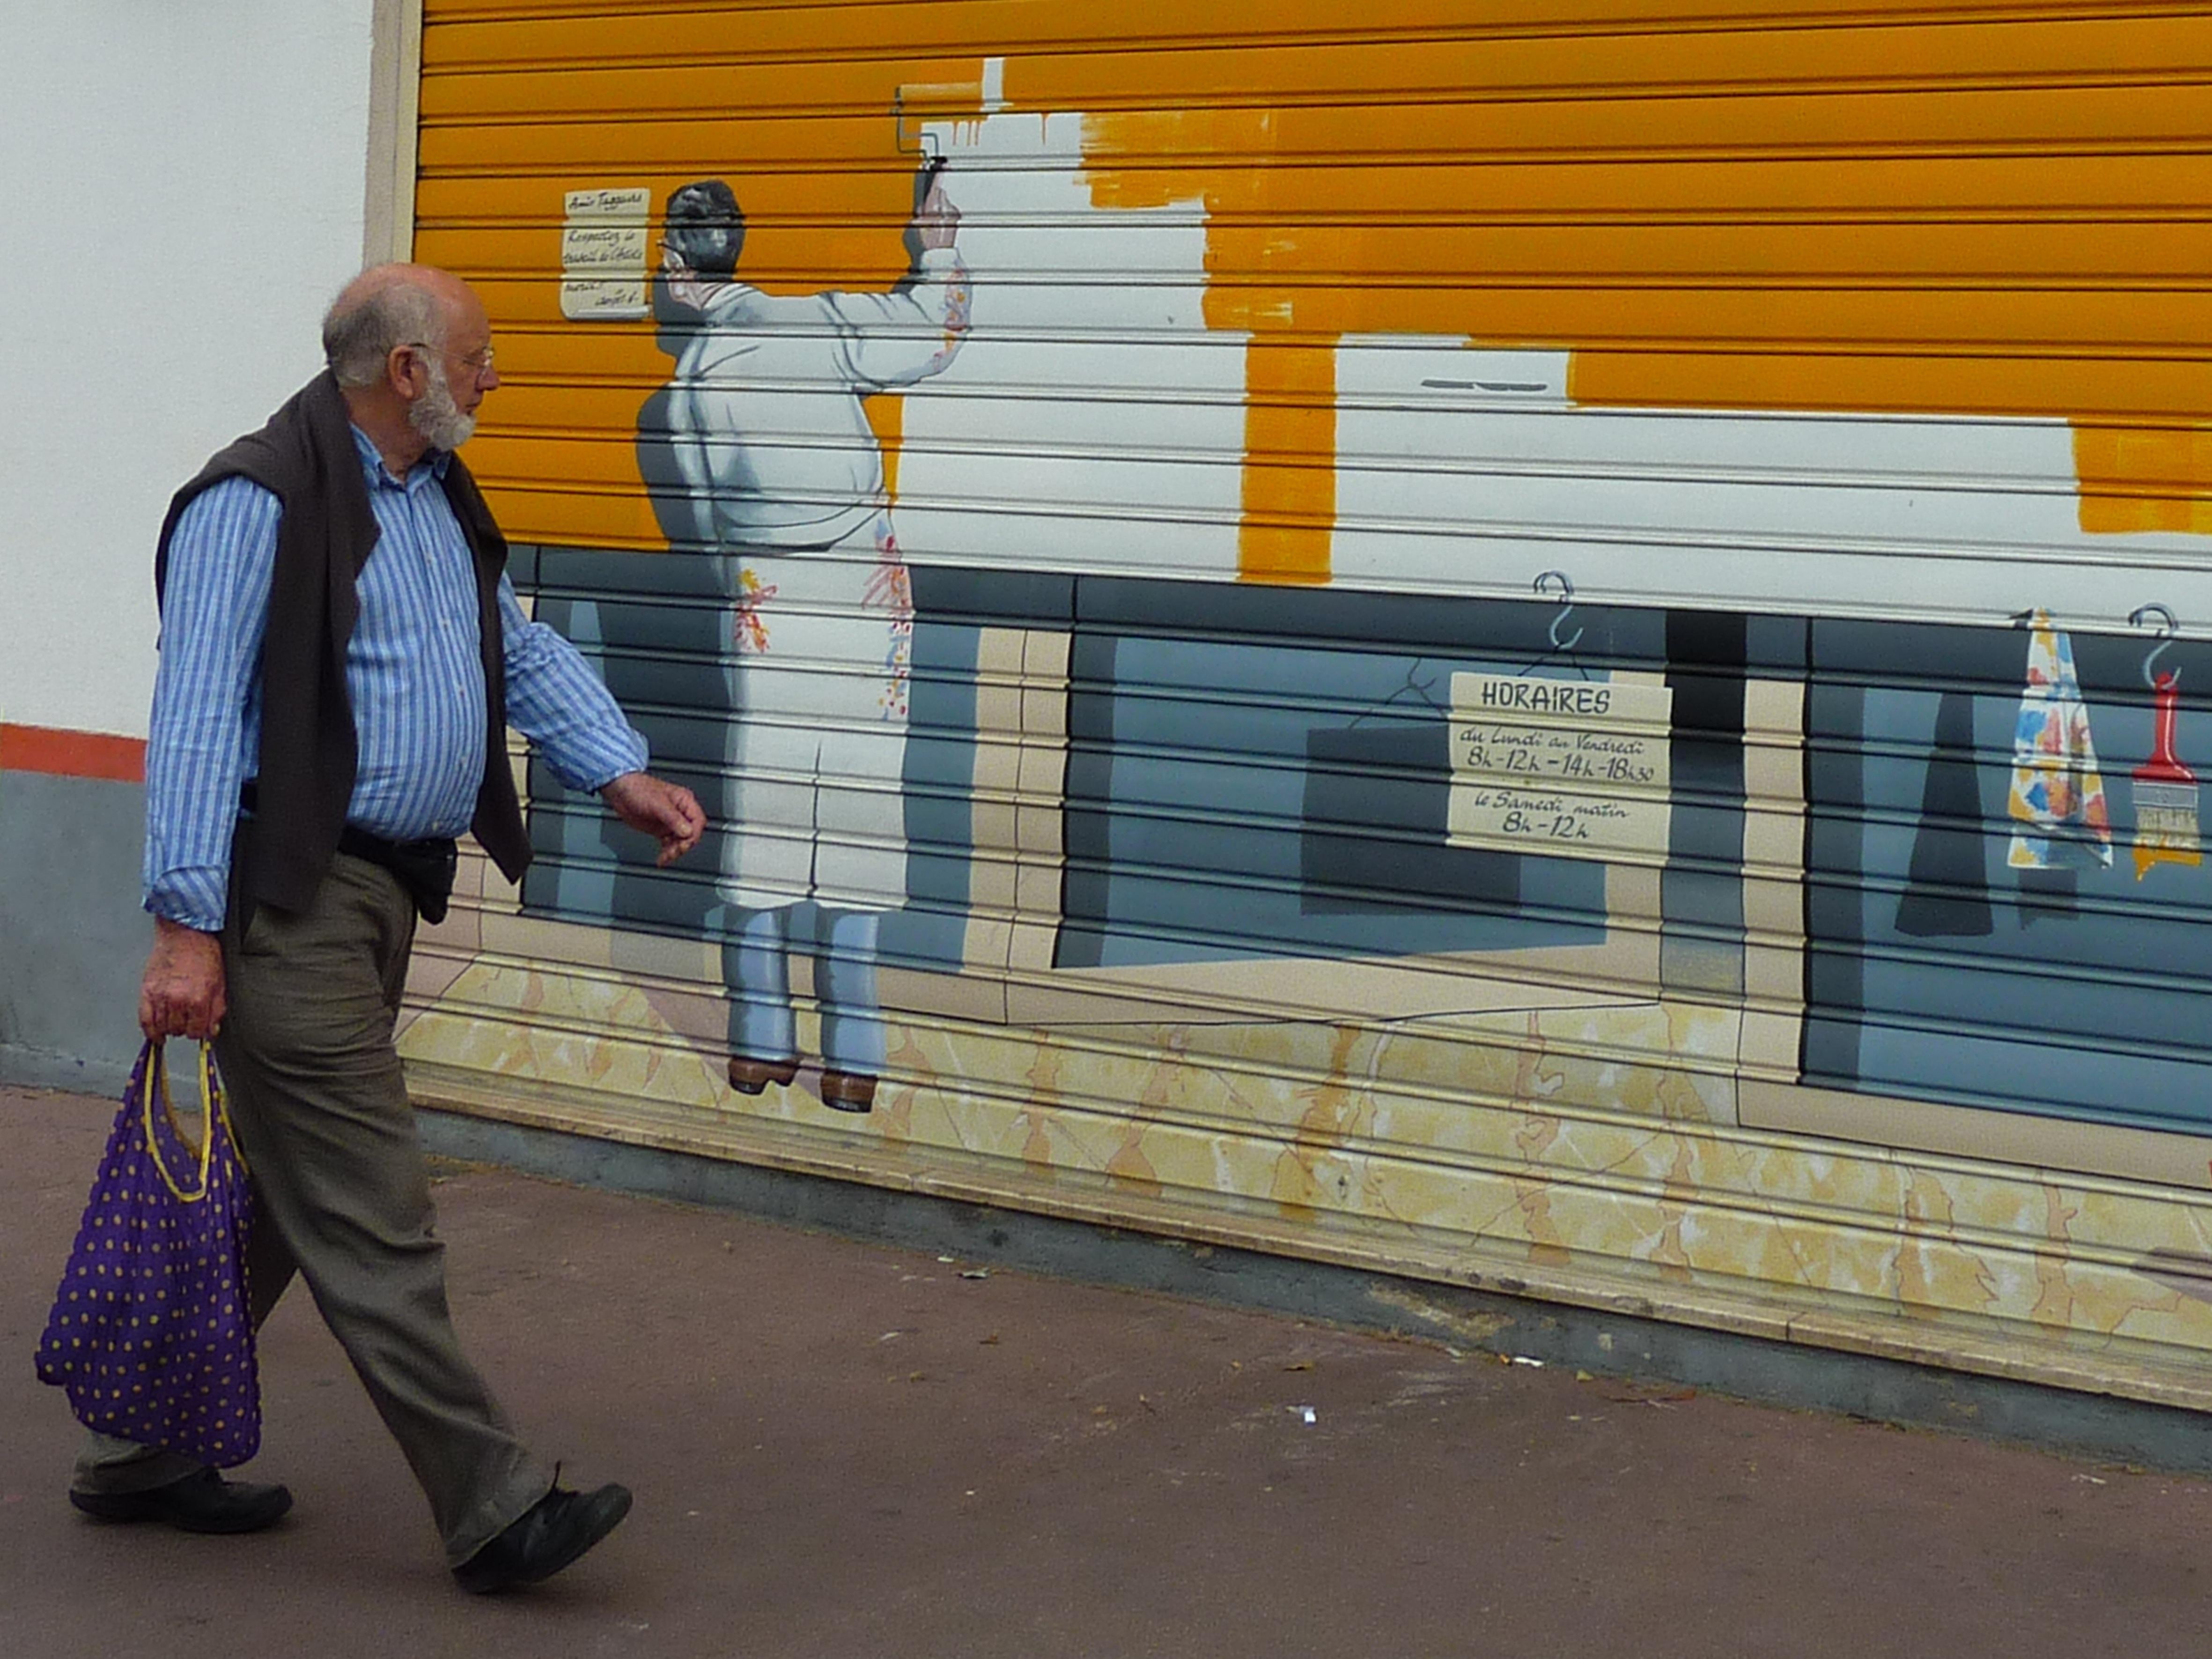 Graffiti art on wood - Pedestrian Wood Street Wall Decoration Color Graffiti Artwork Painting Street Art Art Mural Graffity Graffitti Wall